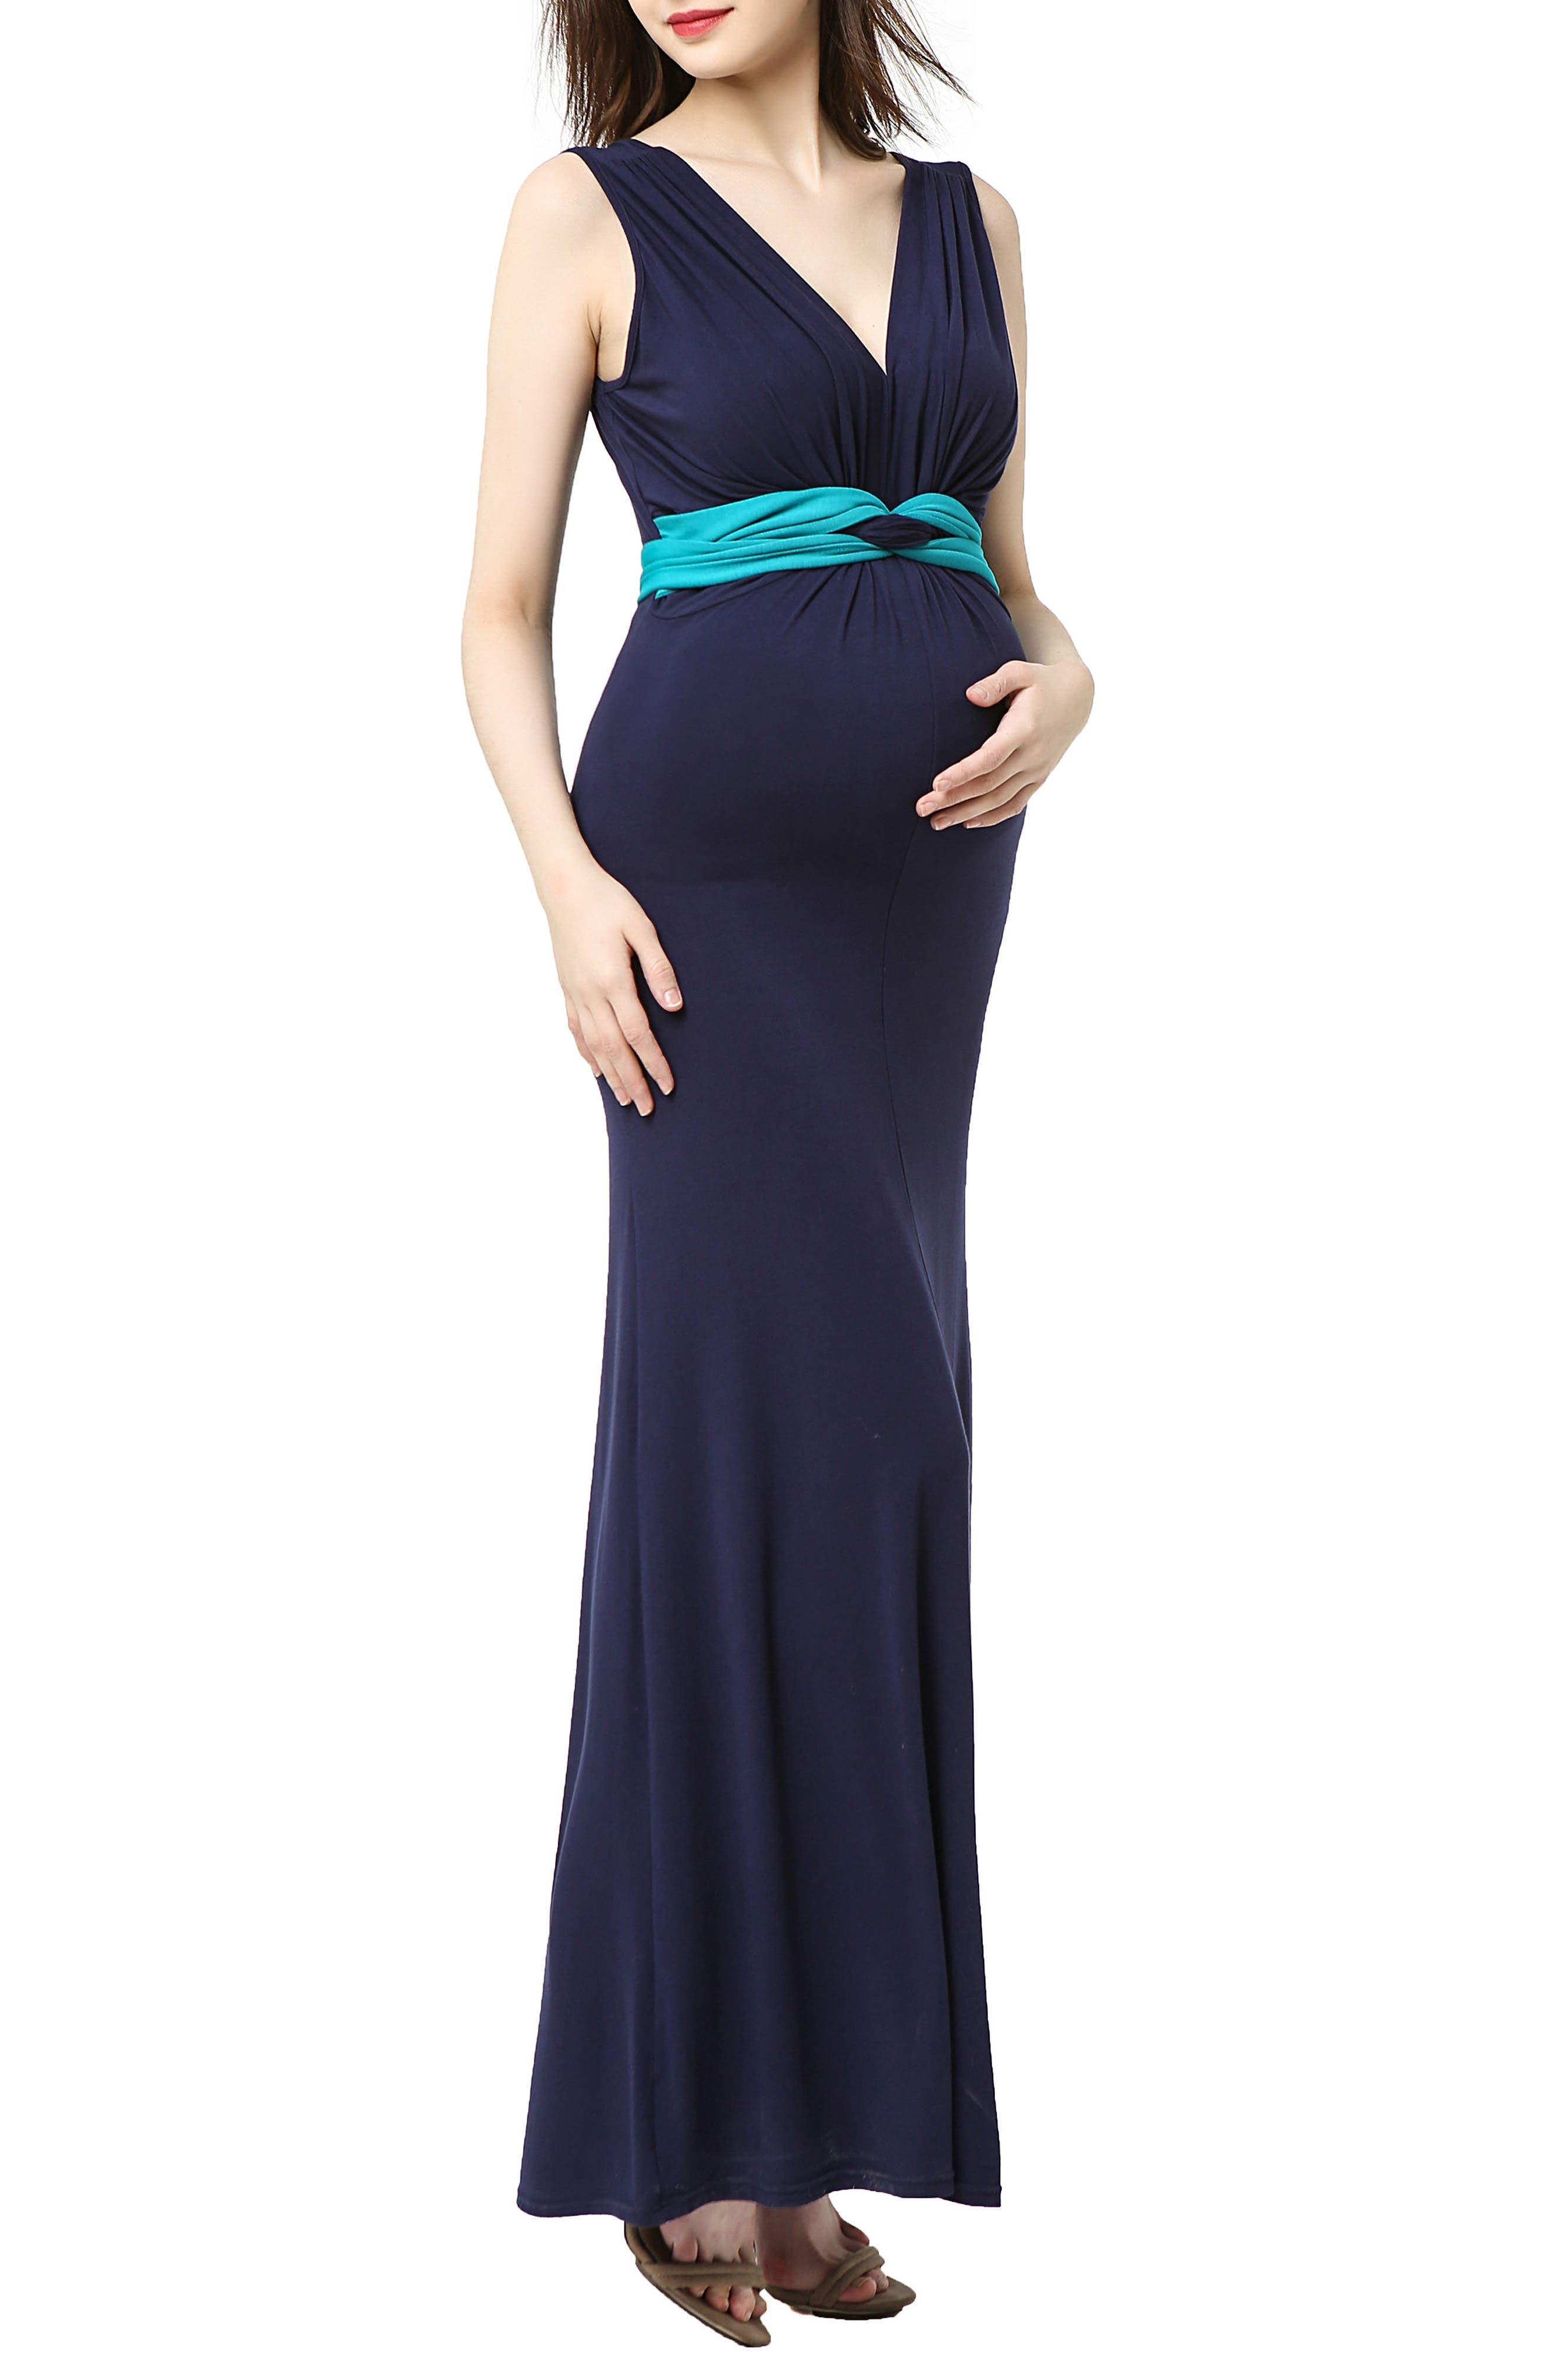 Scarlett Maternity Maxi Dress,                             Main thumbnail 1, color,                             Navy/ Teal